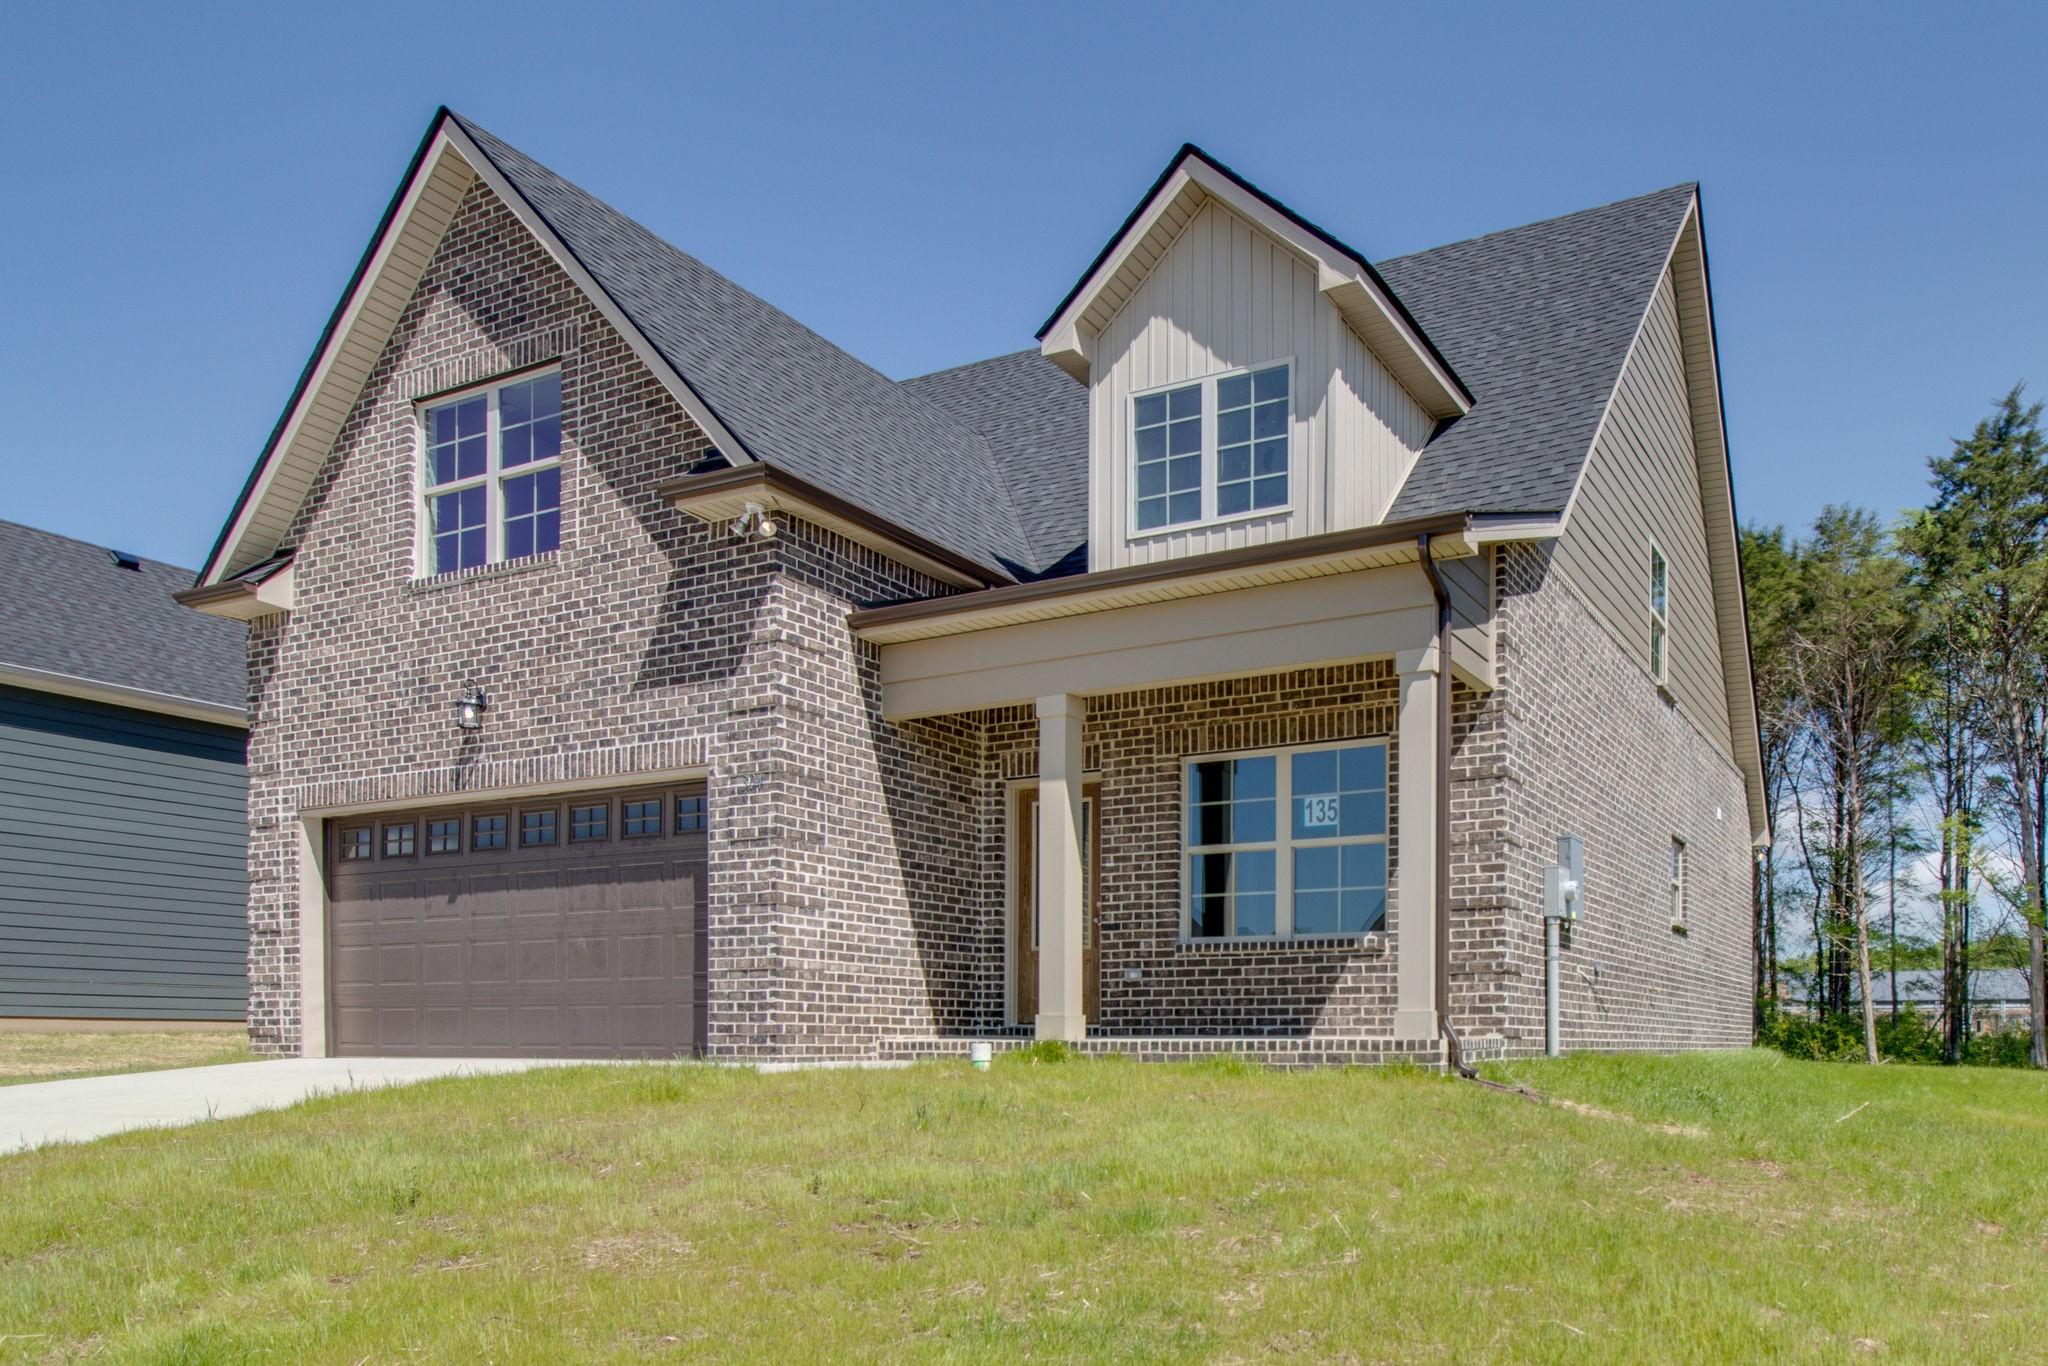 304 Bountiful Dr, Lot 135, Smyrna, TN 37167 - Smyrna, TN real estate listing